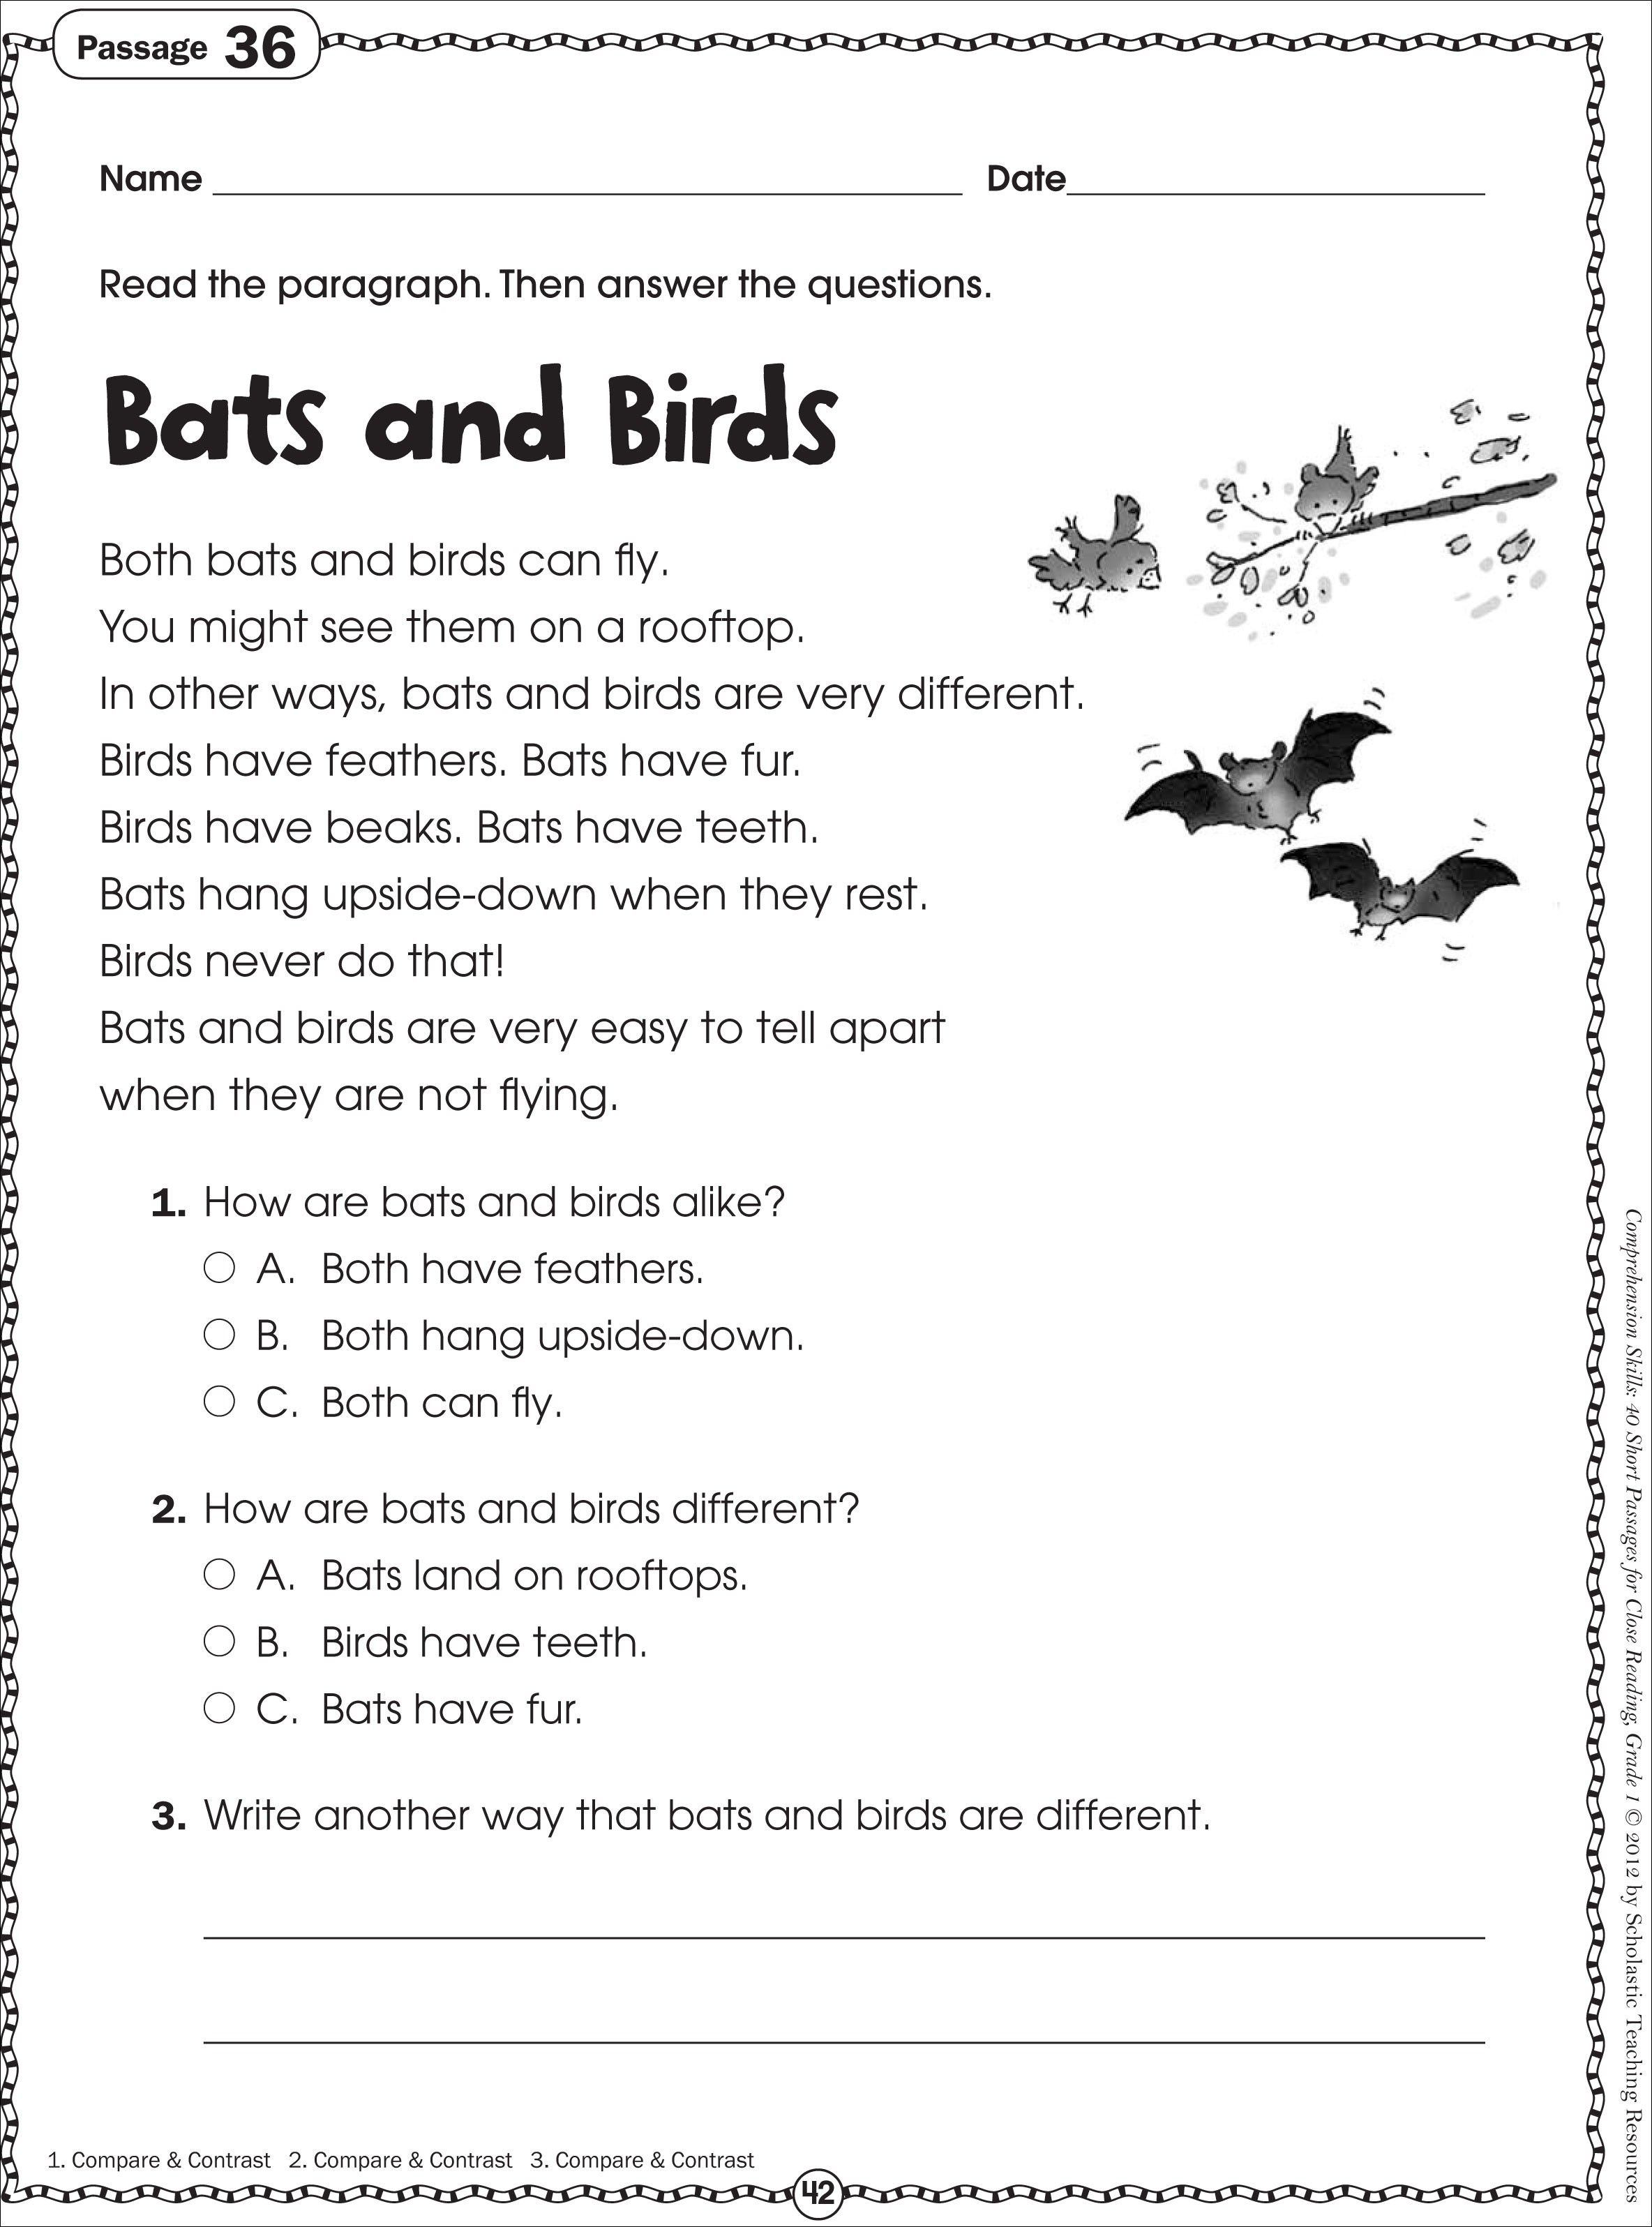 Free Printable Reading Comprehension Worksheets For Kindergarten - Free Printable Groundhog Day Reading Comprehension Worksheets